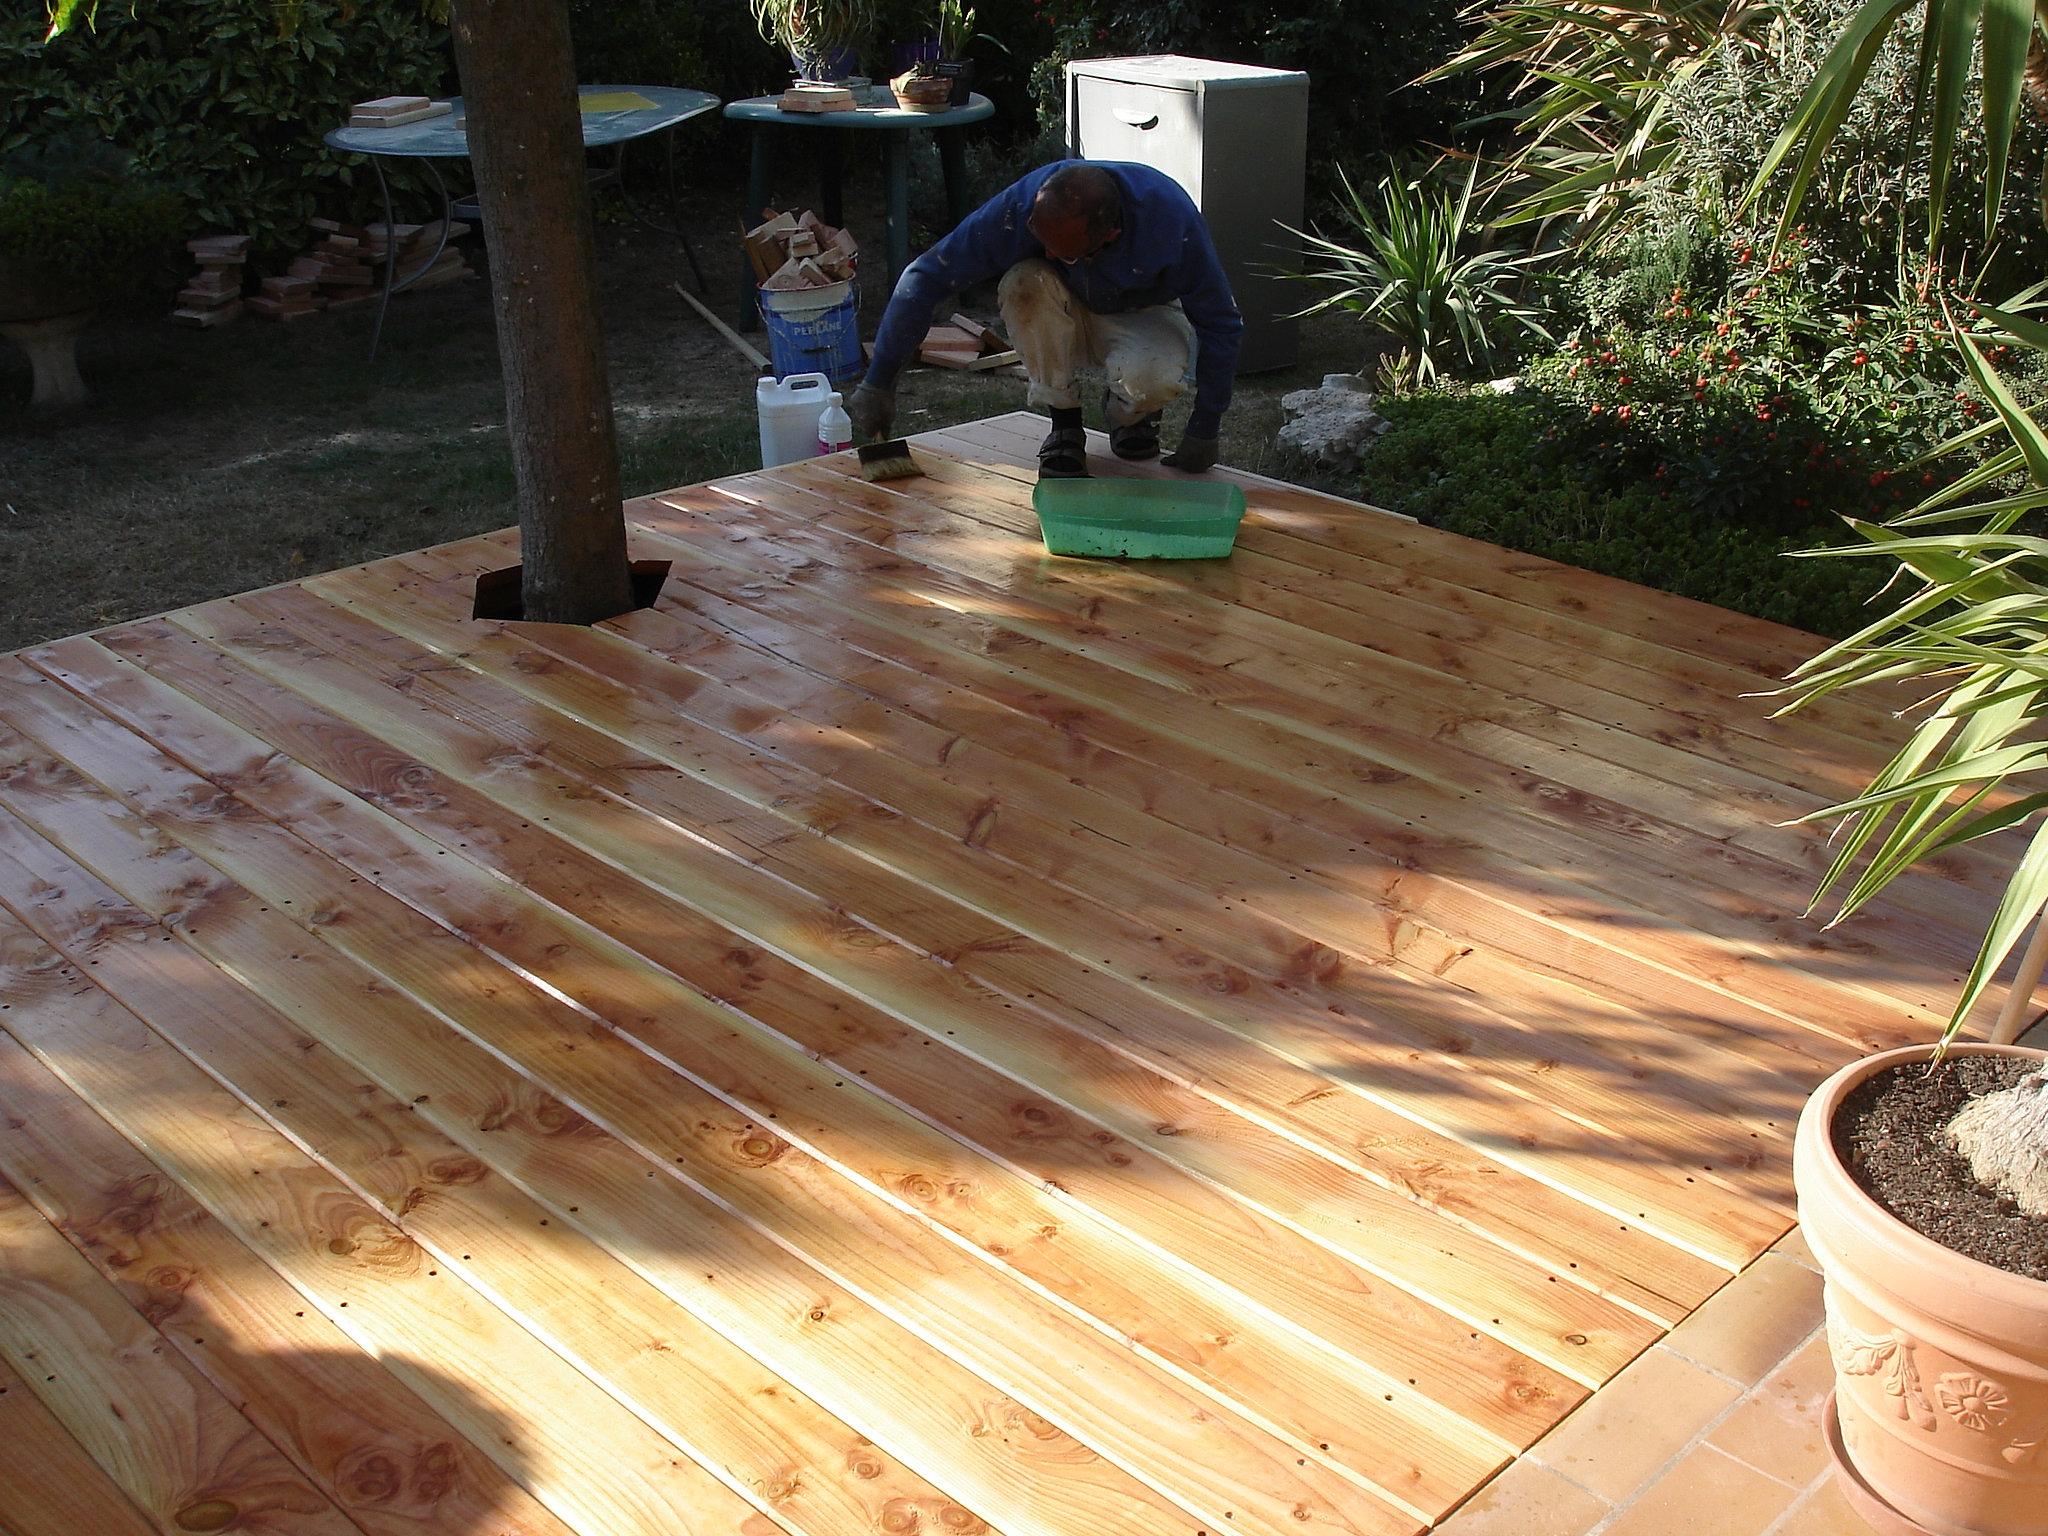 poseur artisan terrasses bois drome 26 terrasse bois douglas # Bois Douglas Pour Terrasse